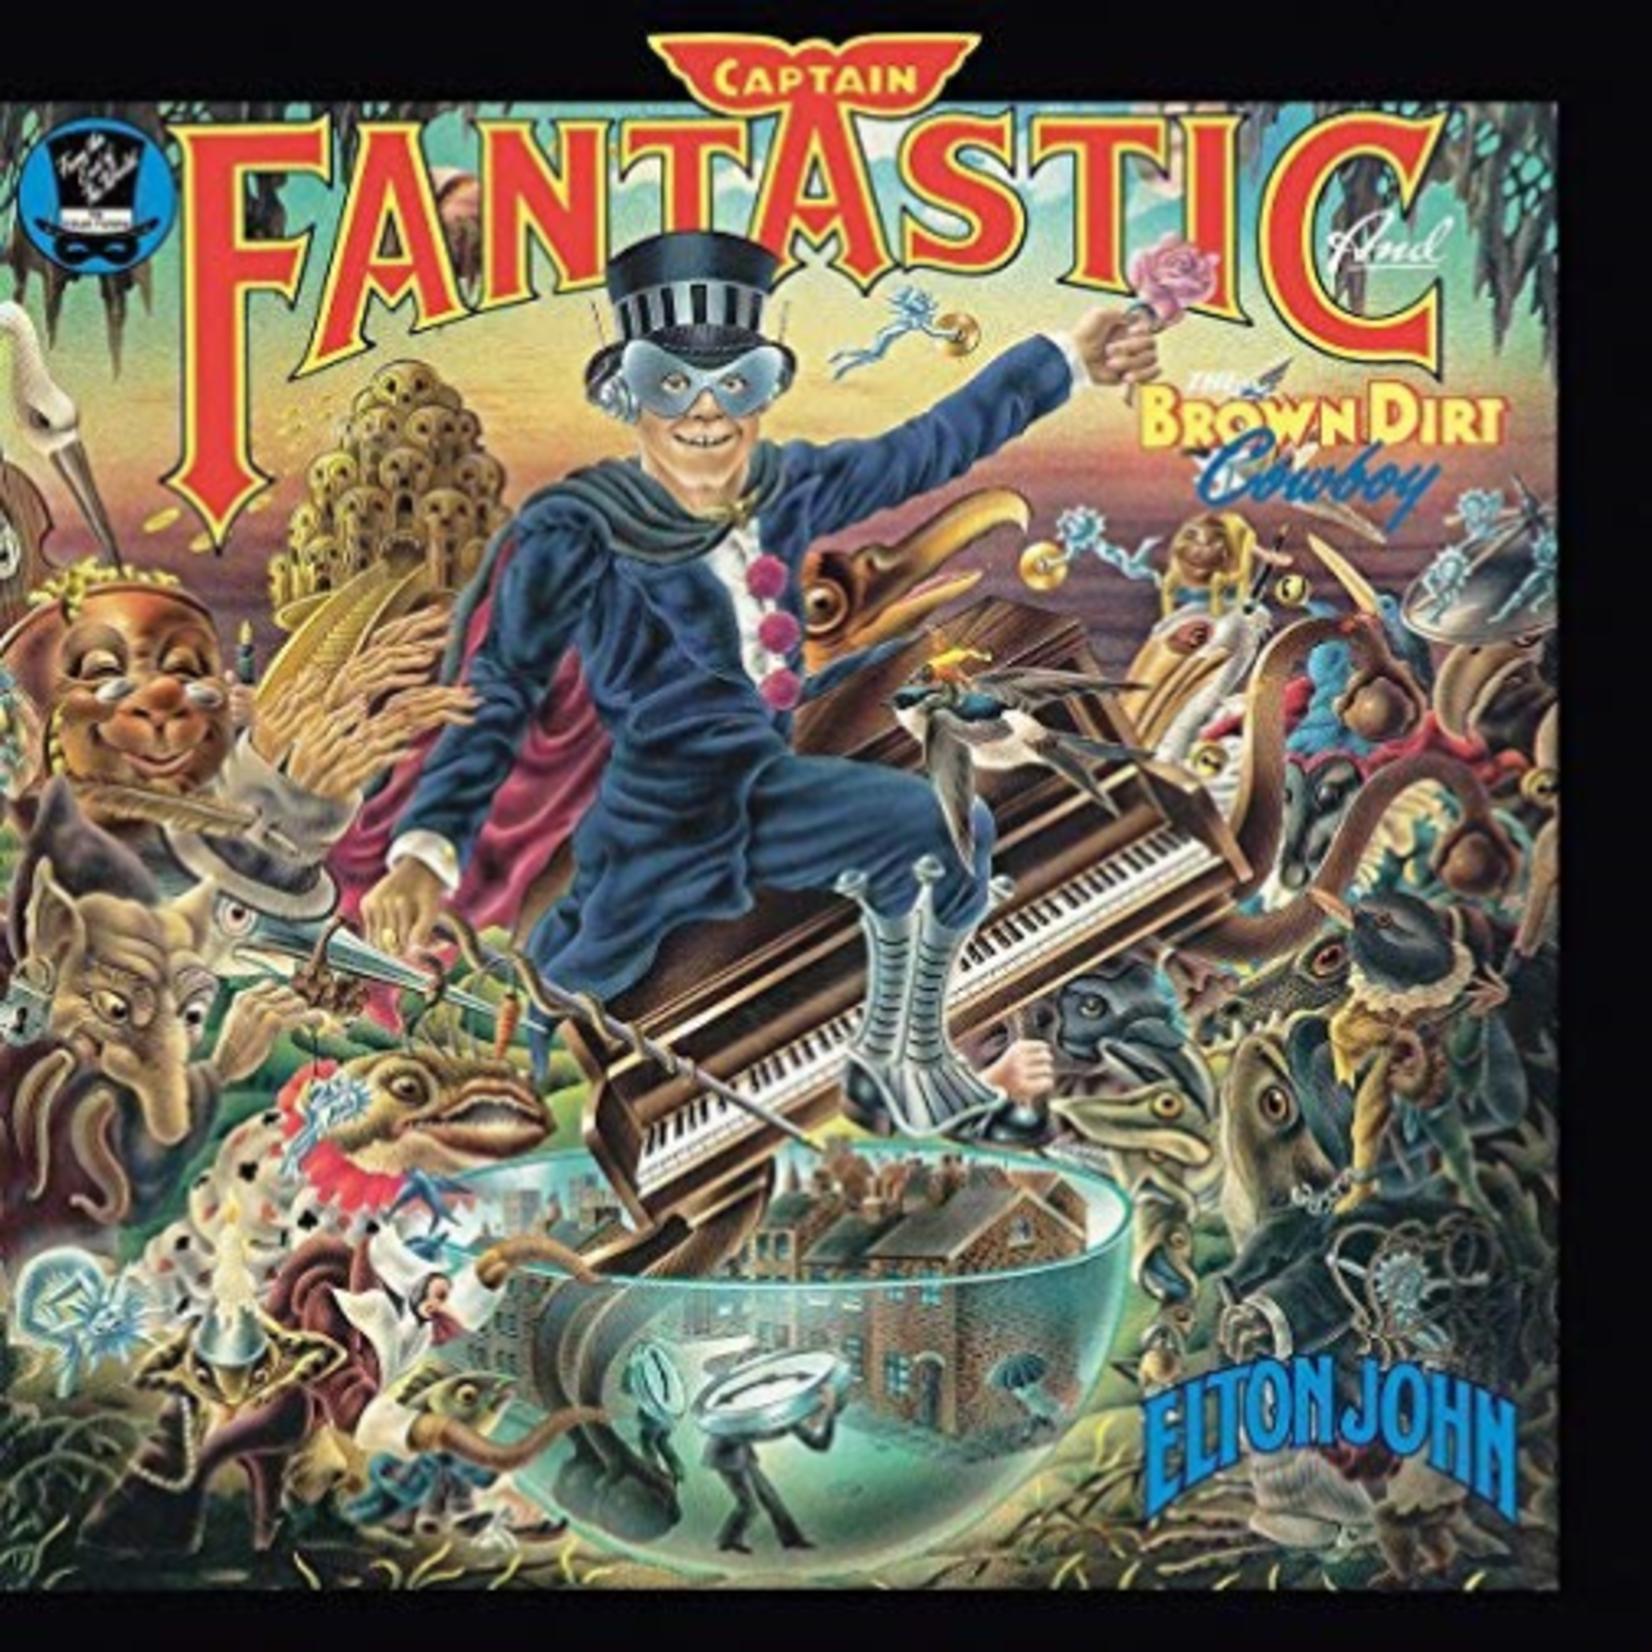 ELTON JOHN CAPTAIN FANTASTIC AND THE BROWN DIRT COWBOY (LP)